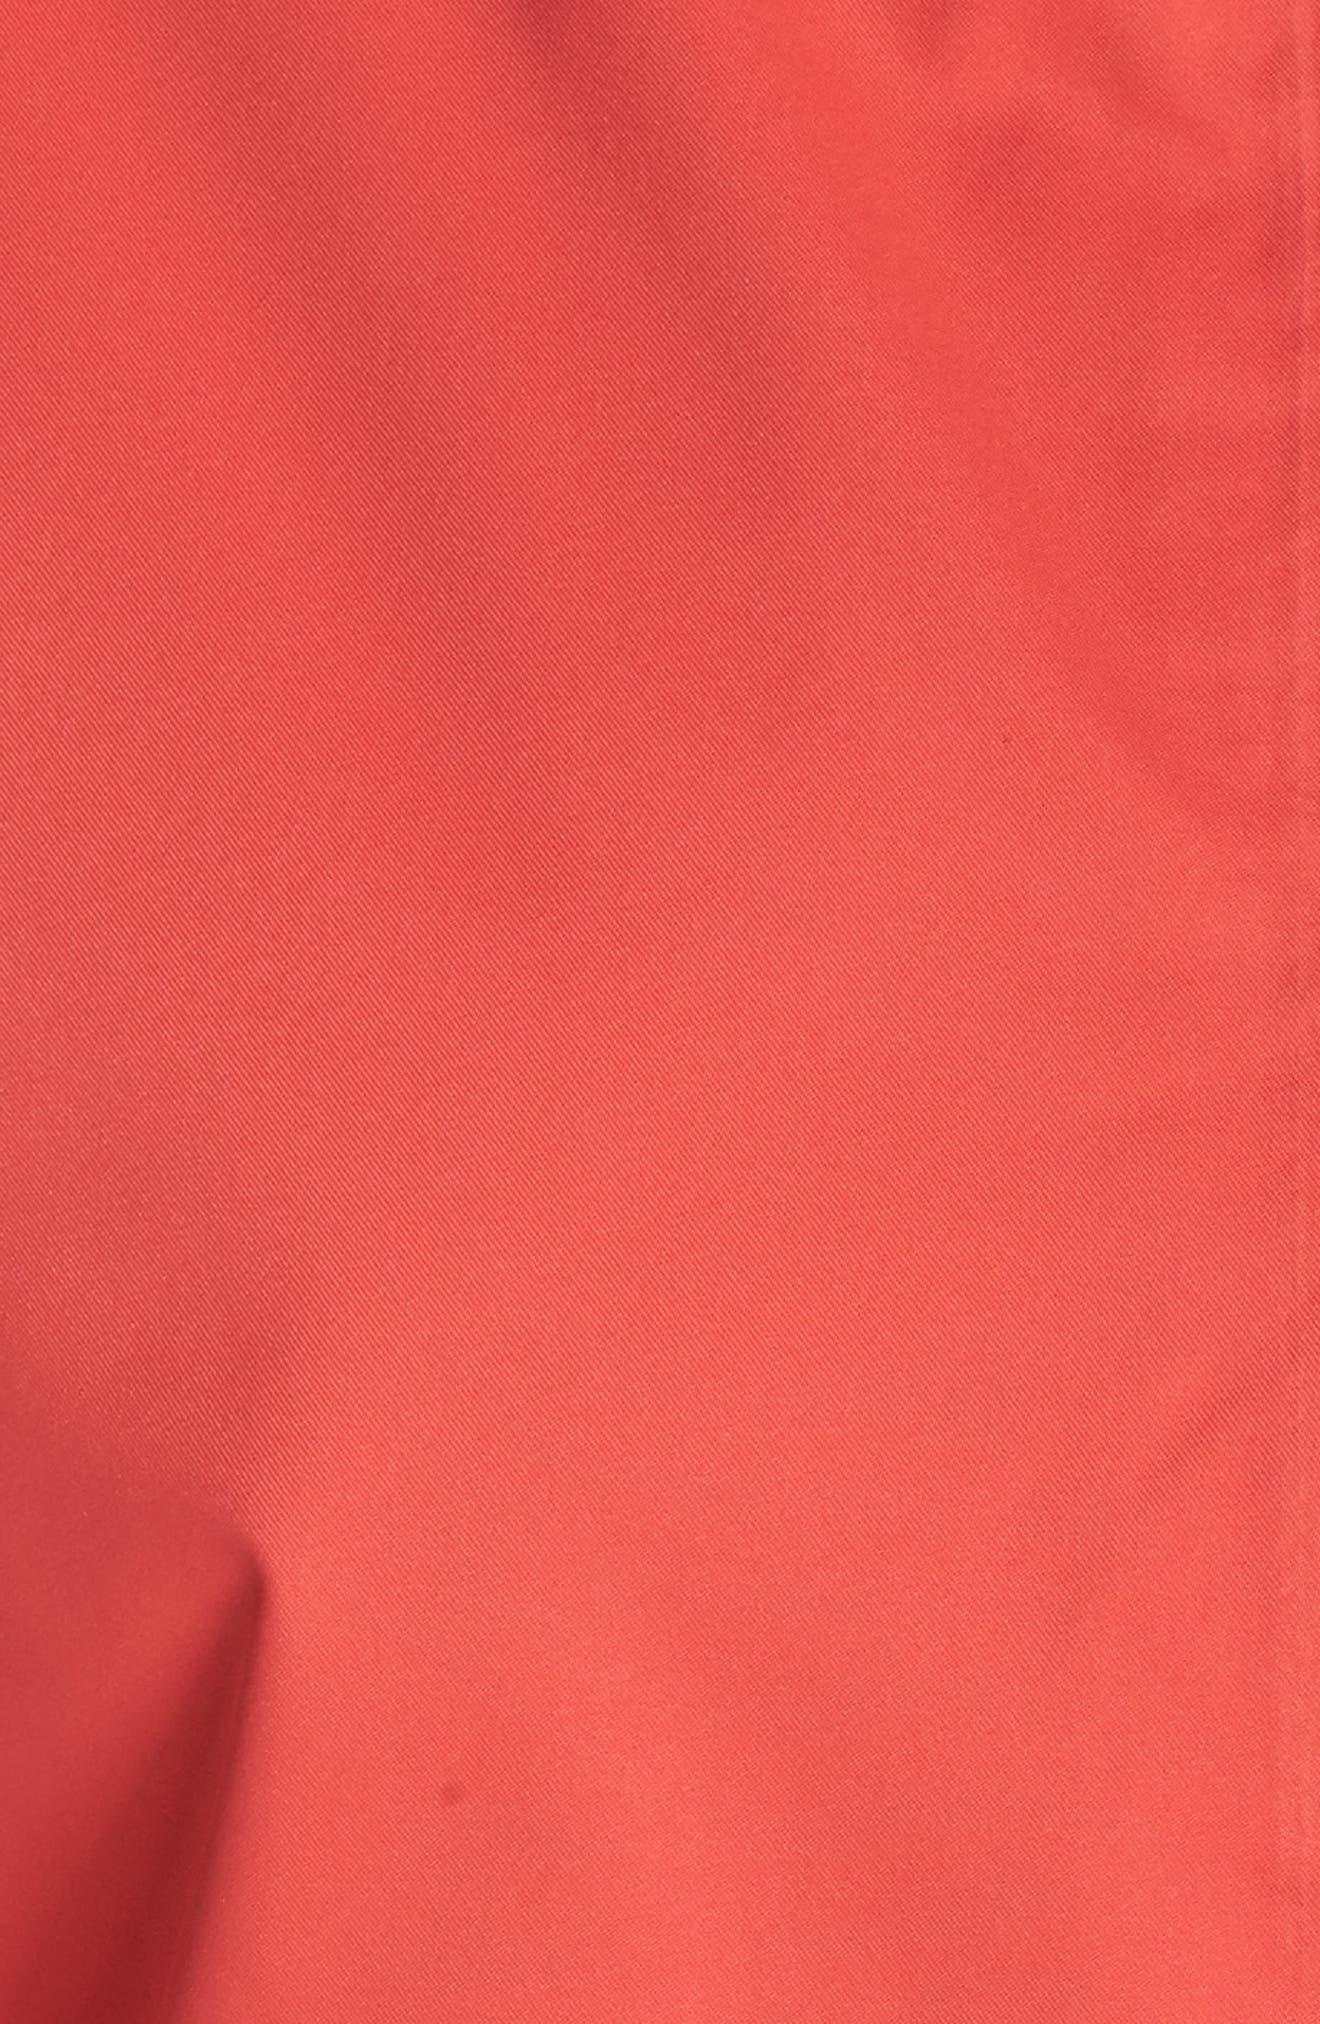 PATAGONIA,                             Snowbelle Insulated Ski Jacket,                             Alternate thumbnail 7, color,                             601